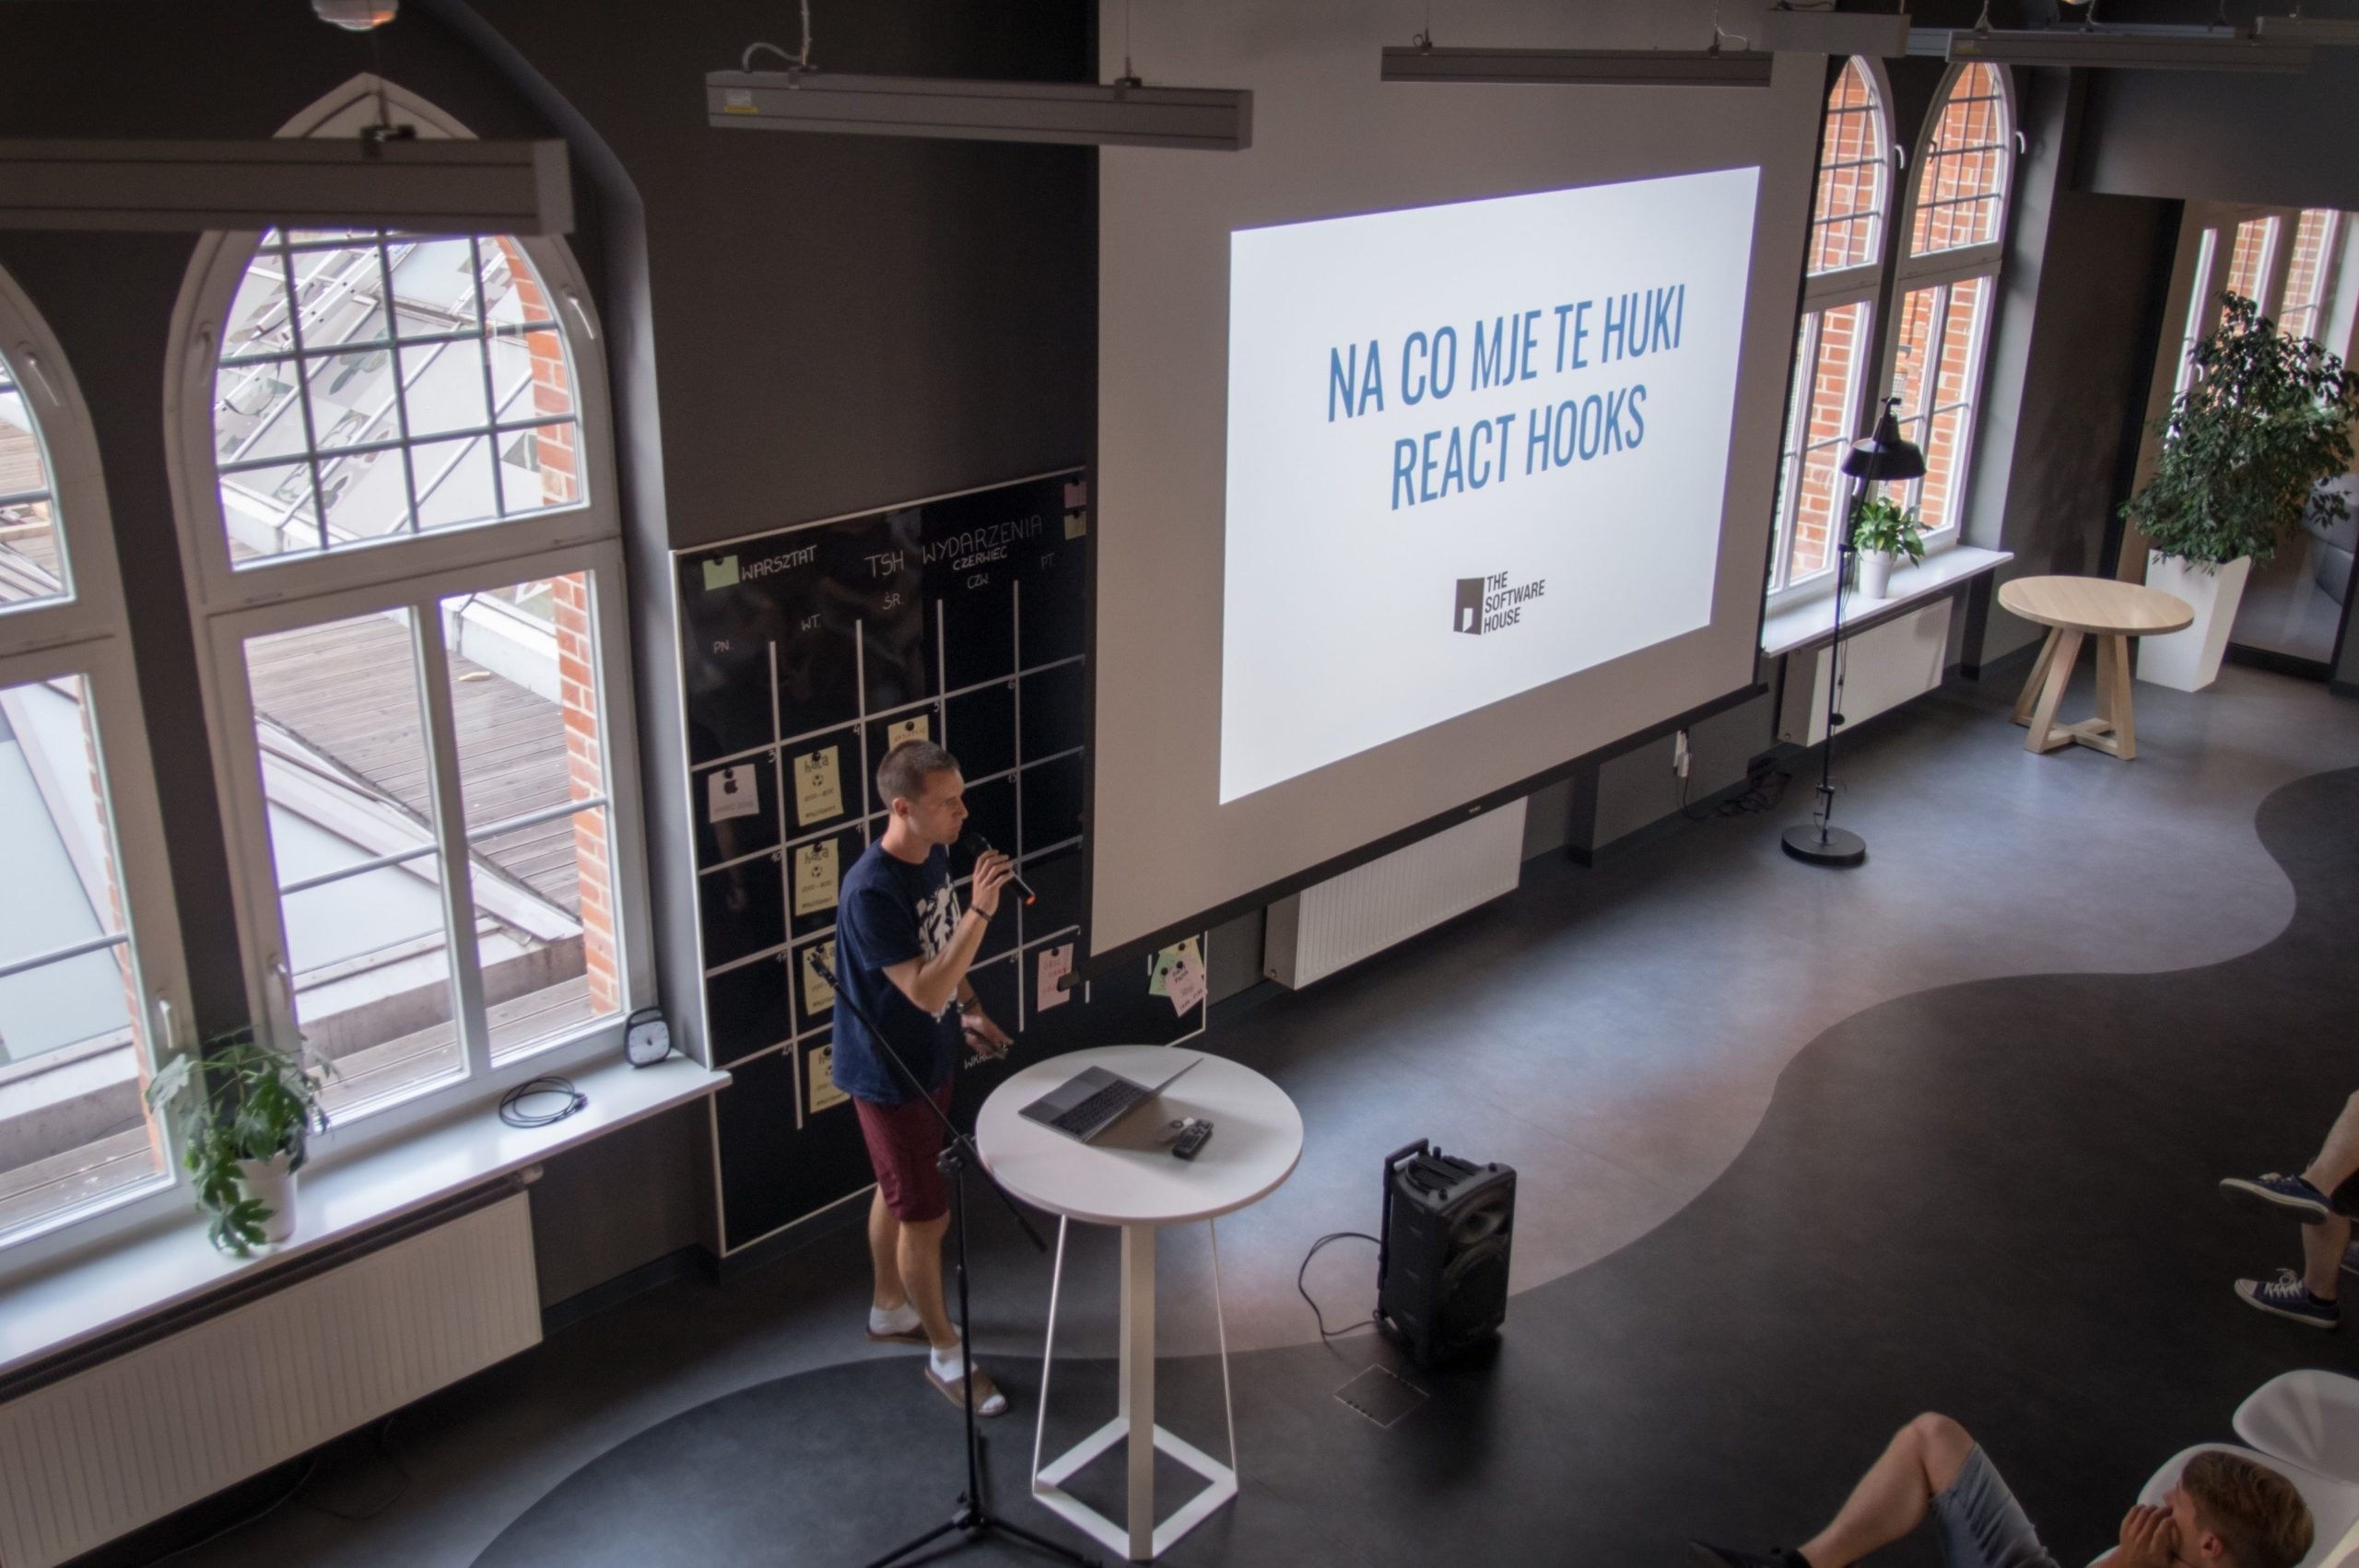 developer presentation during meetup